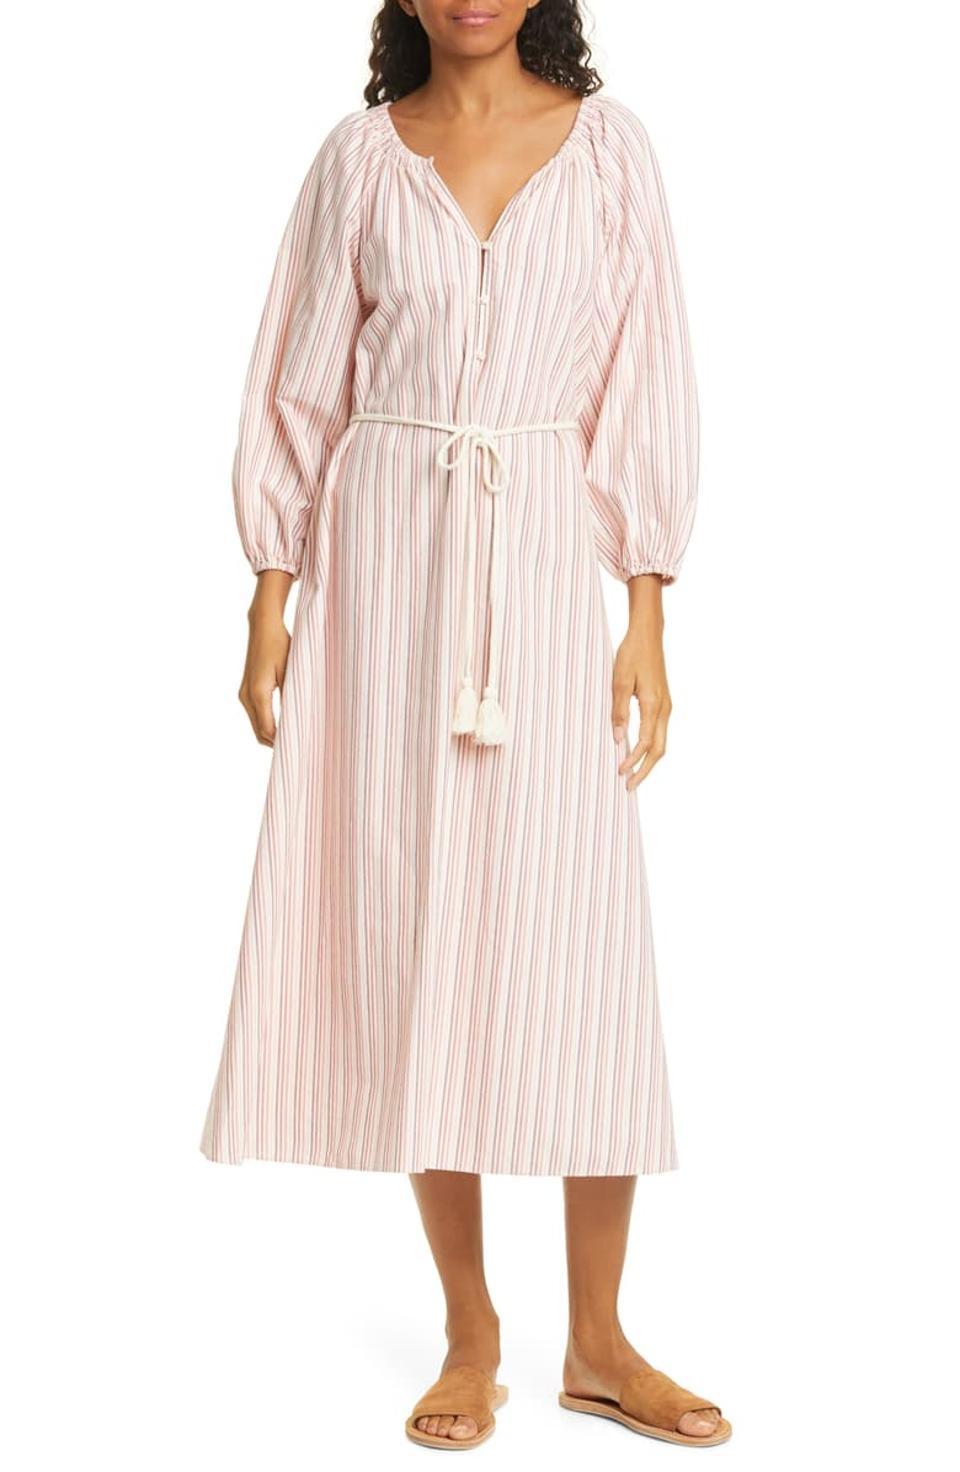 The Derby Stripe Dress